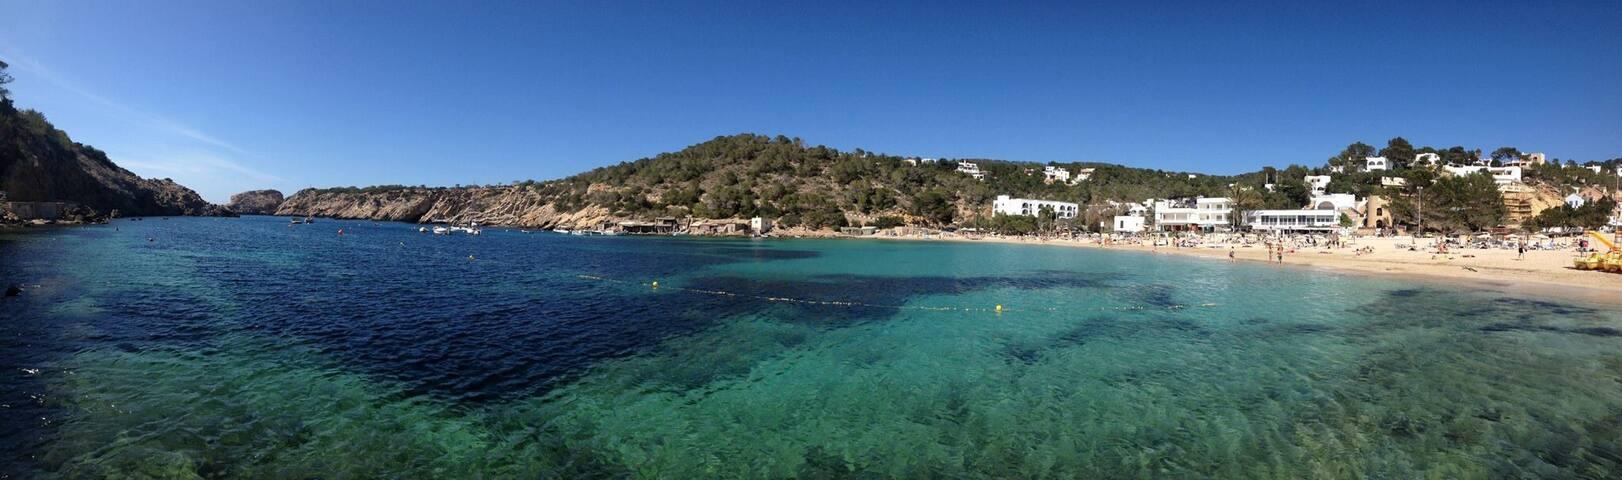 Rent apartment Ibiza - Sant Josep de sa Talaia - Pis